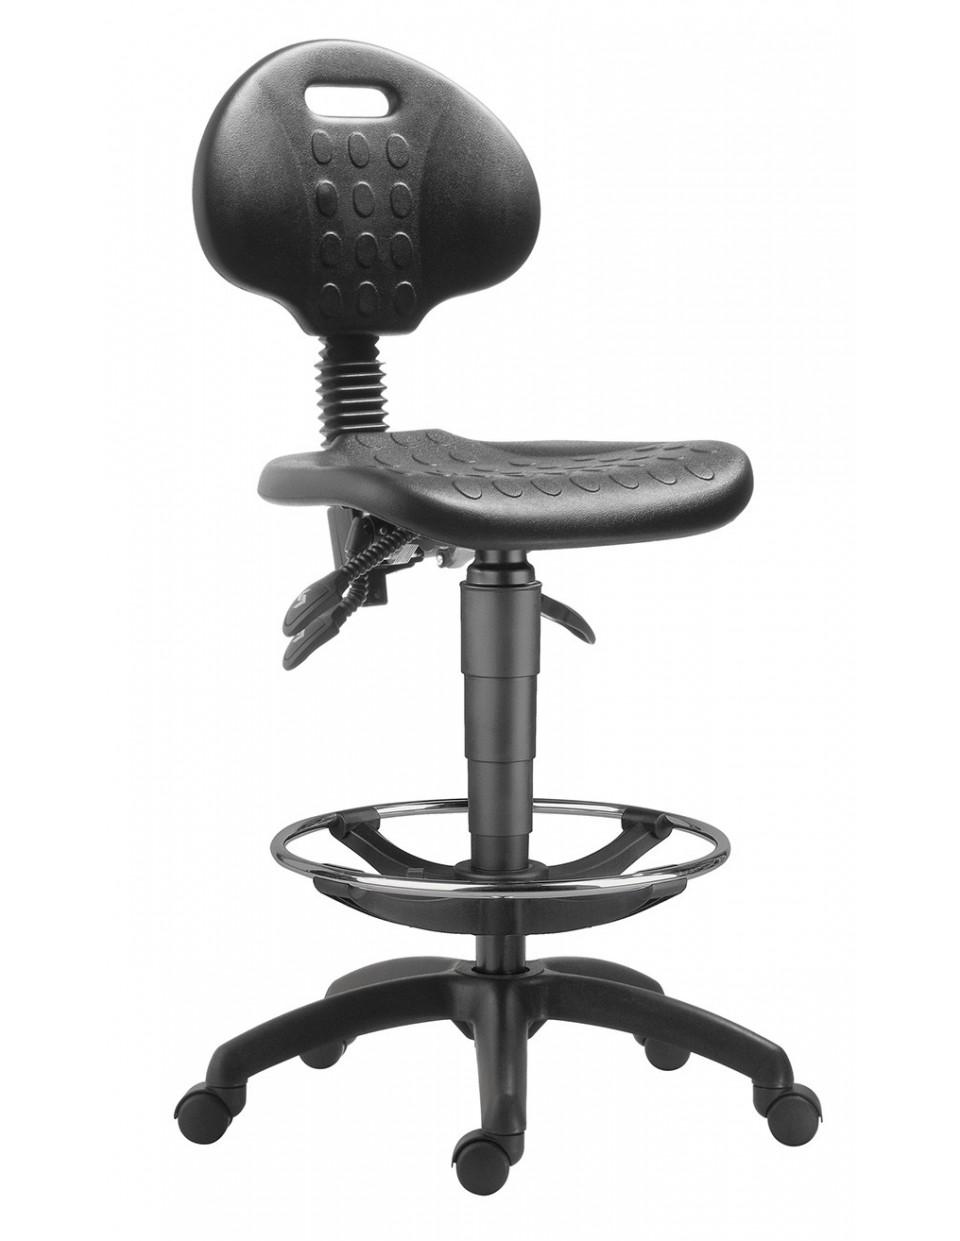 industrijska-stolica-1290-pu-asyn-ext-vn